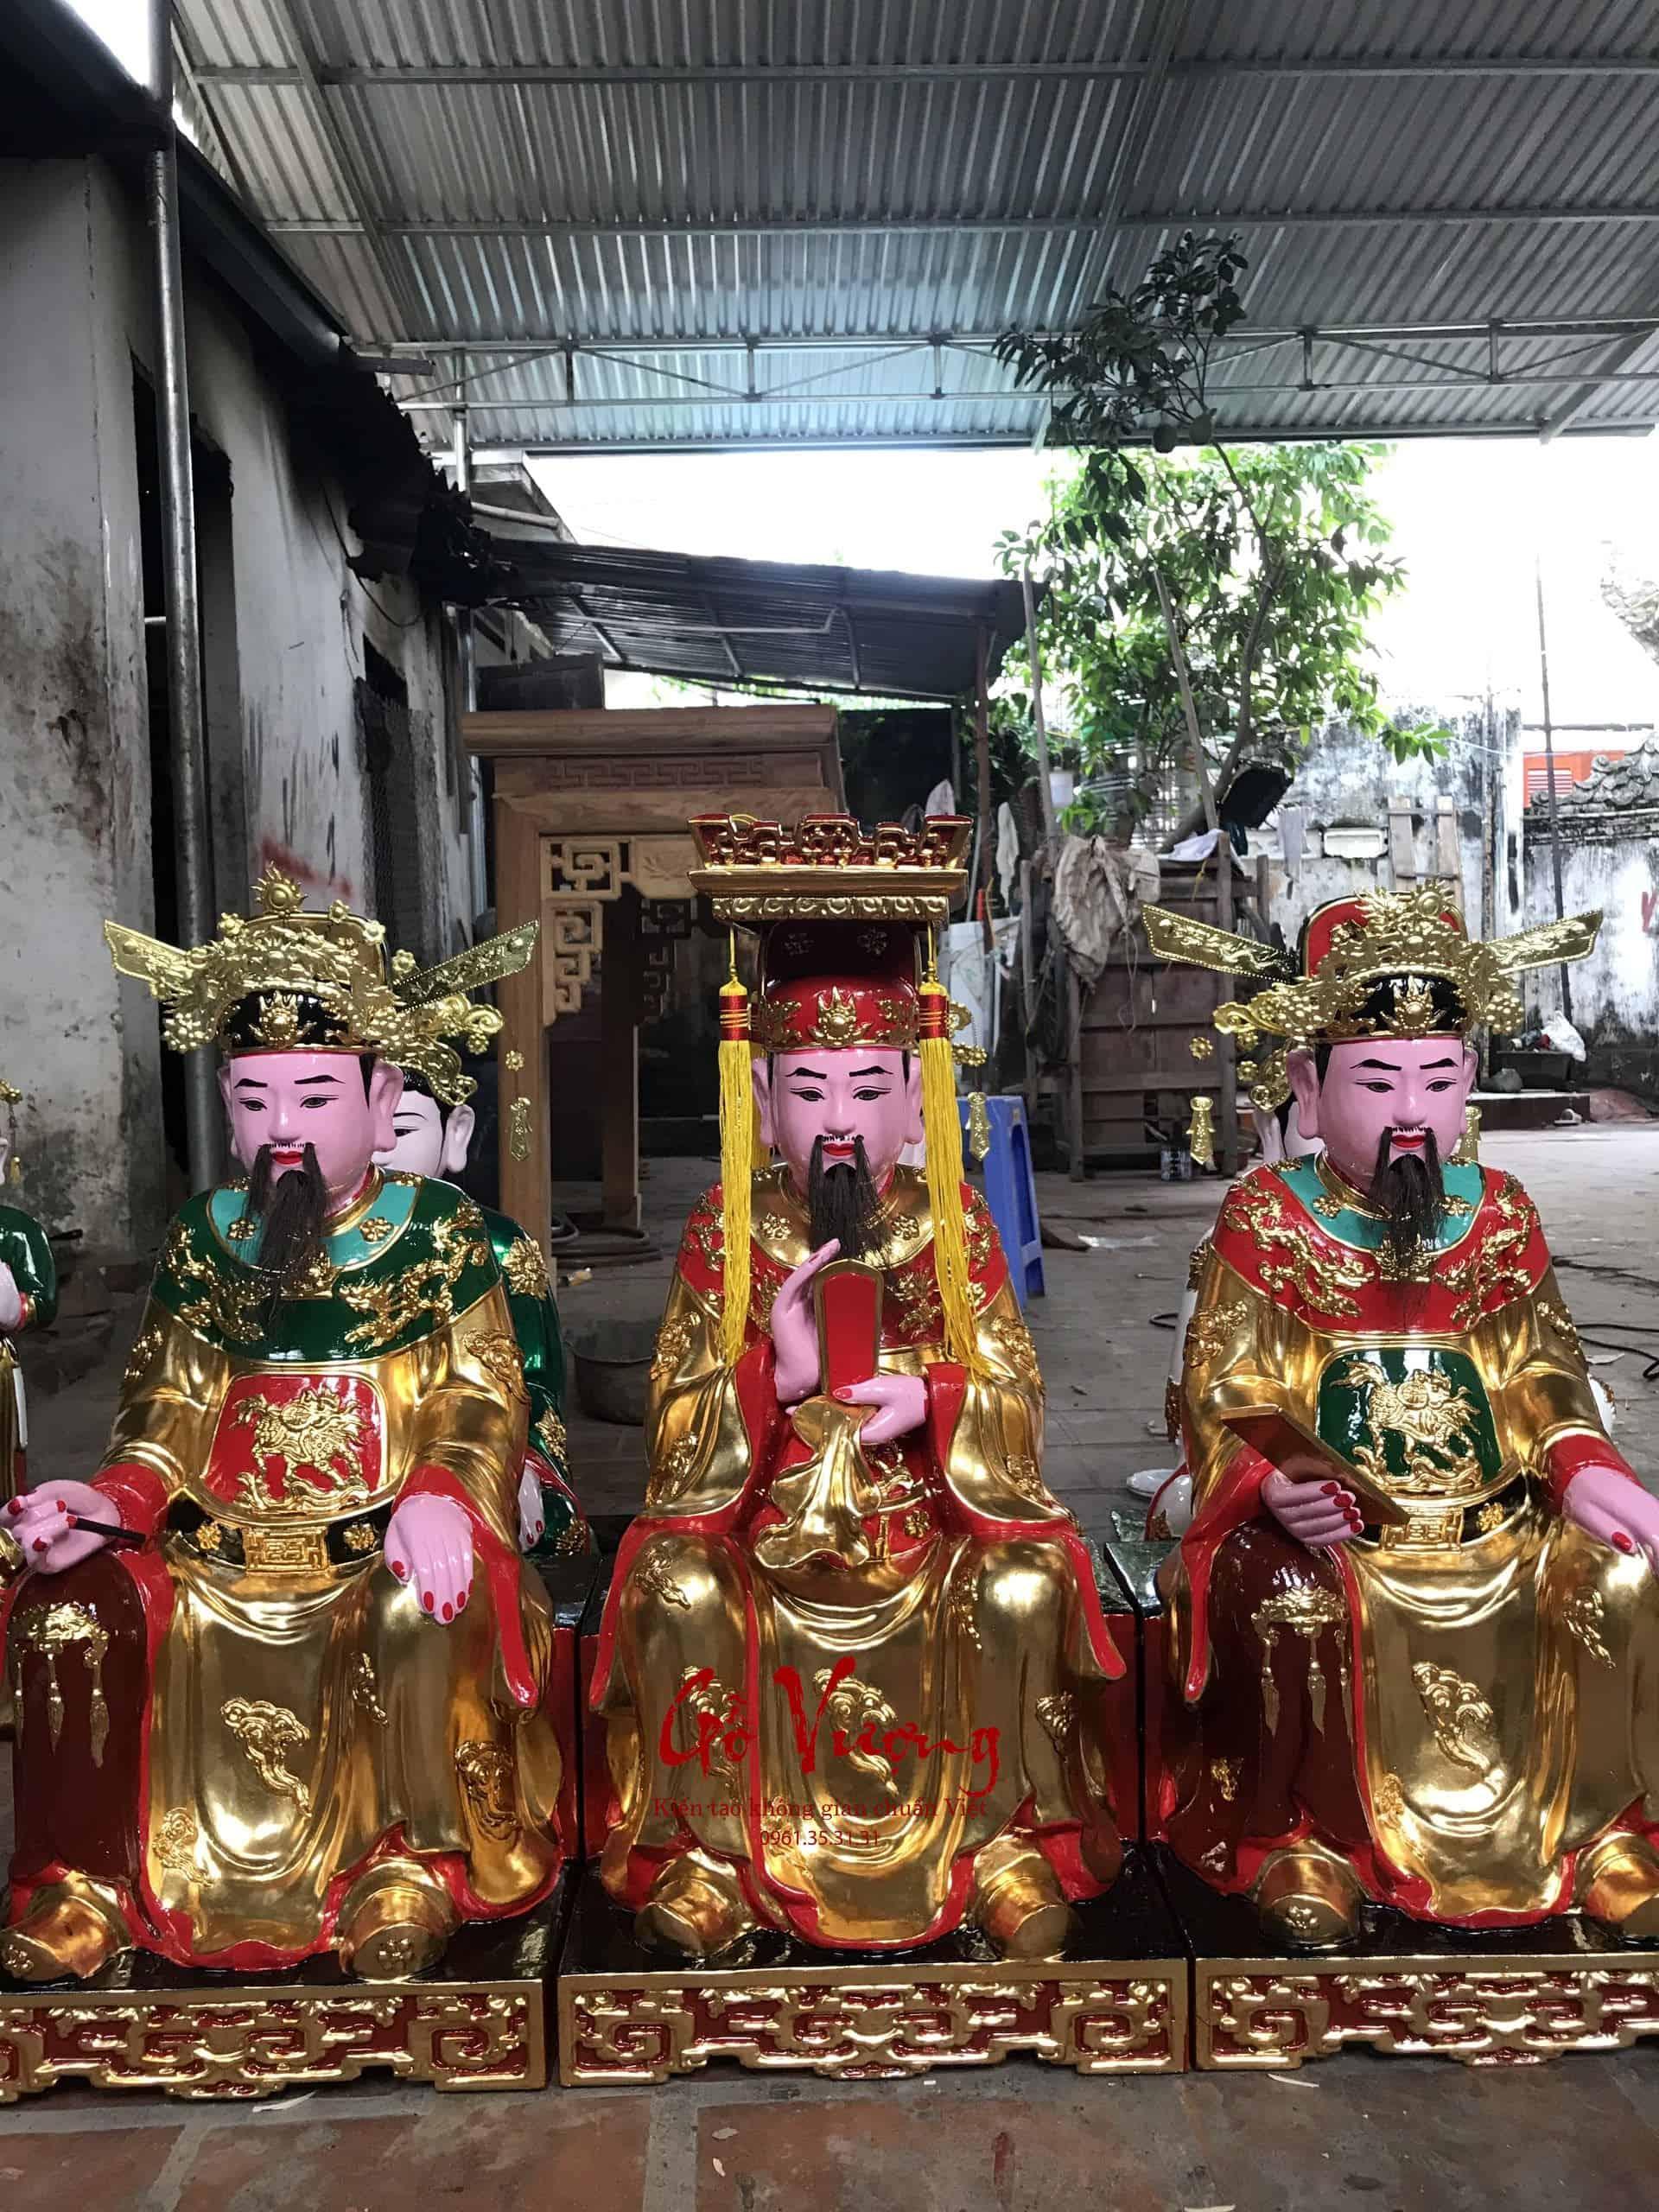 Thong Tin Tuong Nam Tao Bac Dau